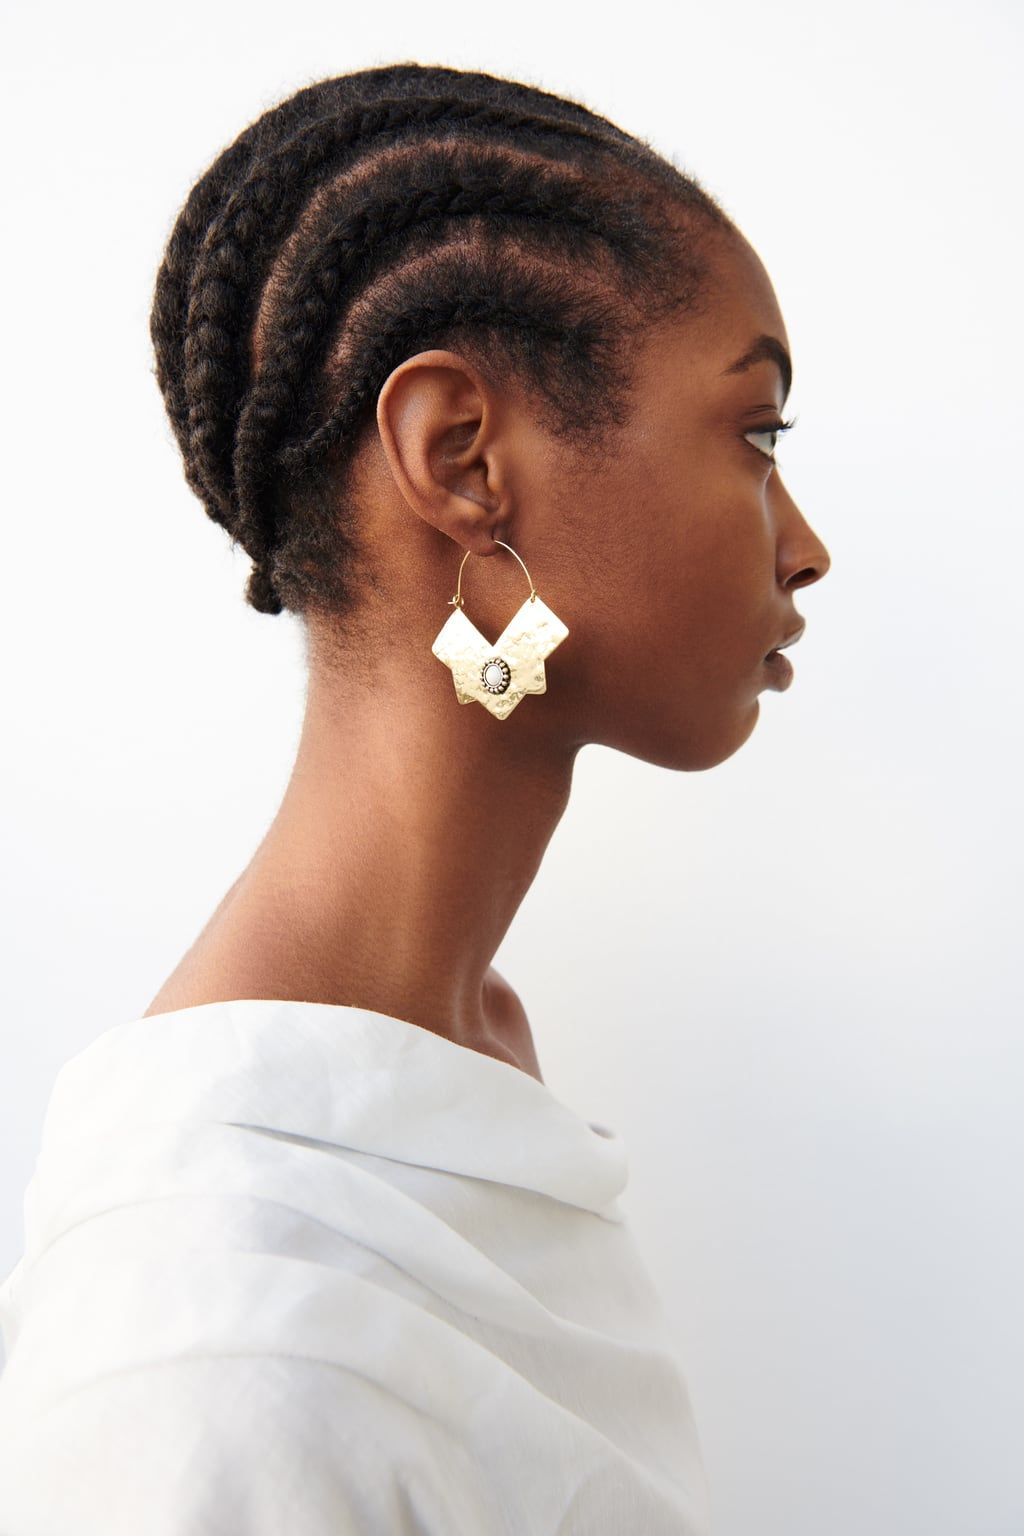 GEOMETRIC EARRINGS - NEW IN-WOMAN   ZARA United Kingdom   Natural hair styles, African ...